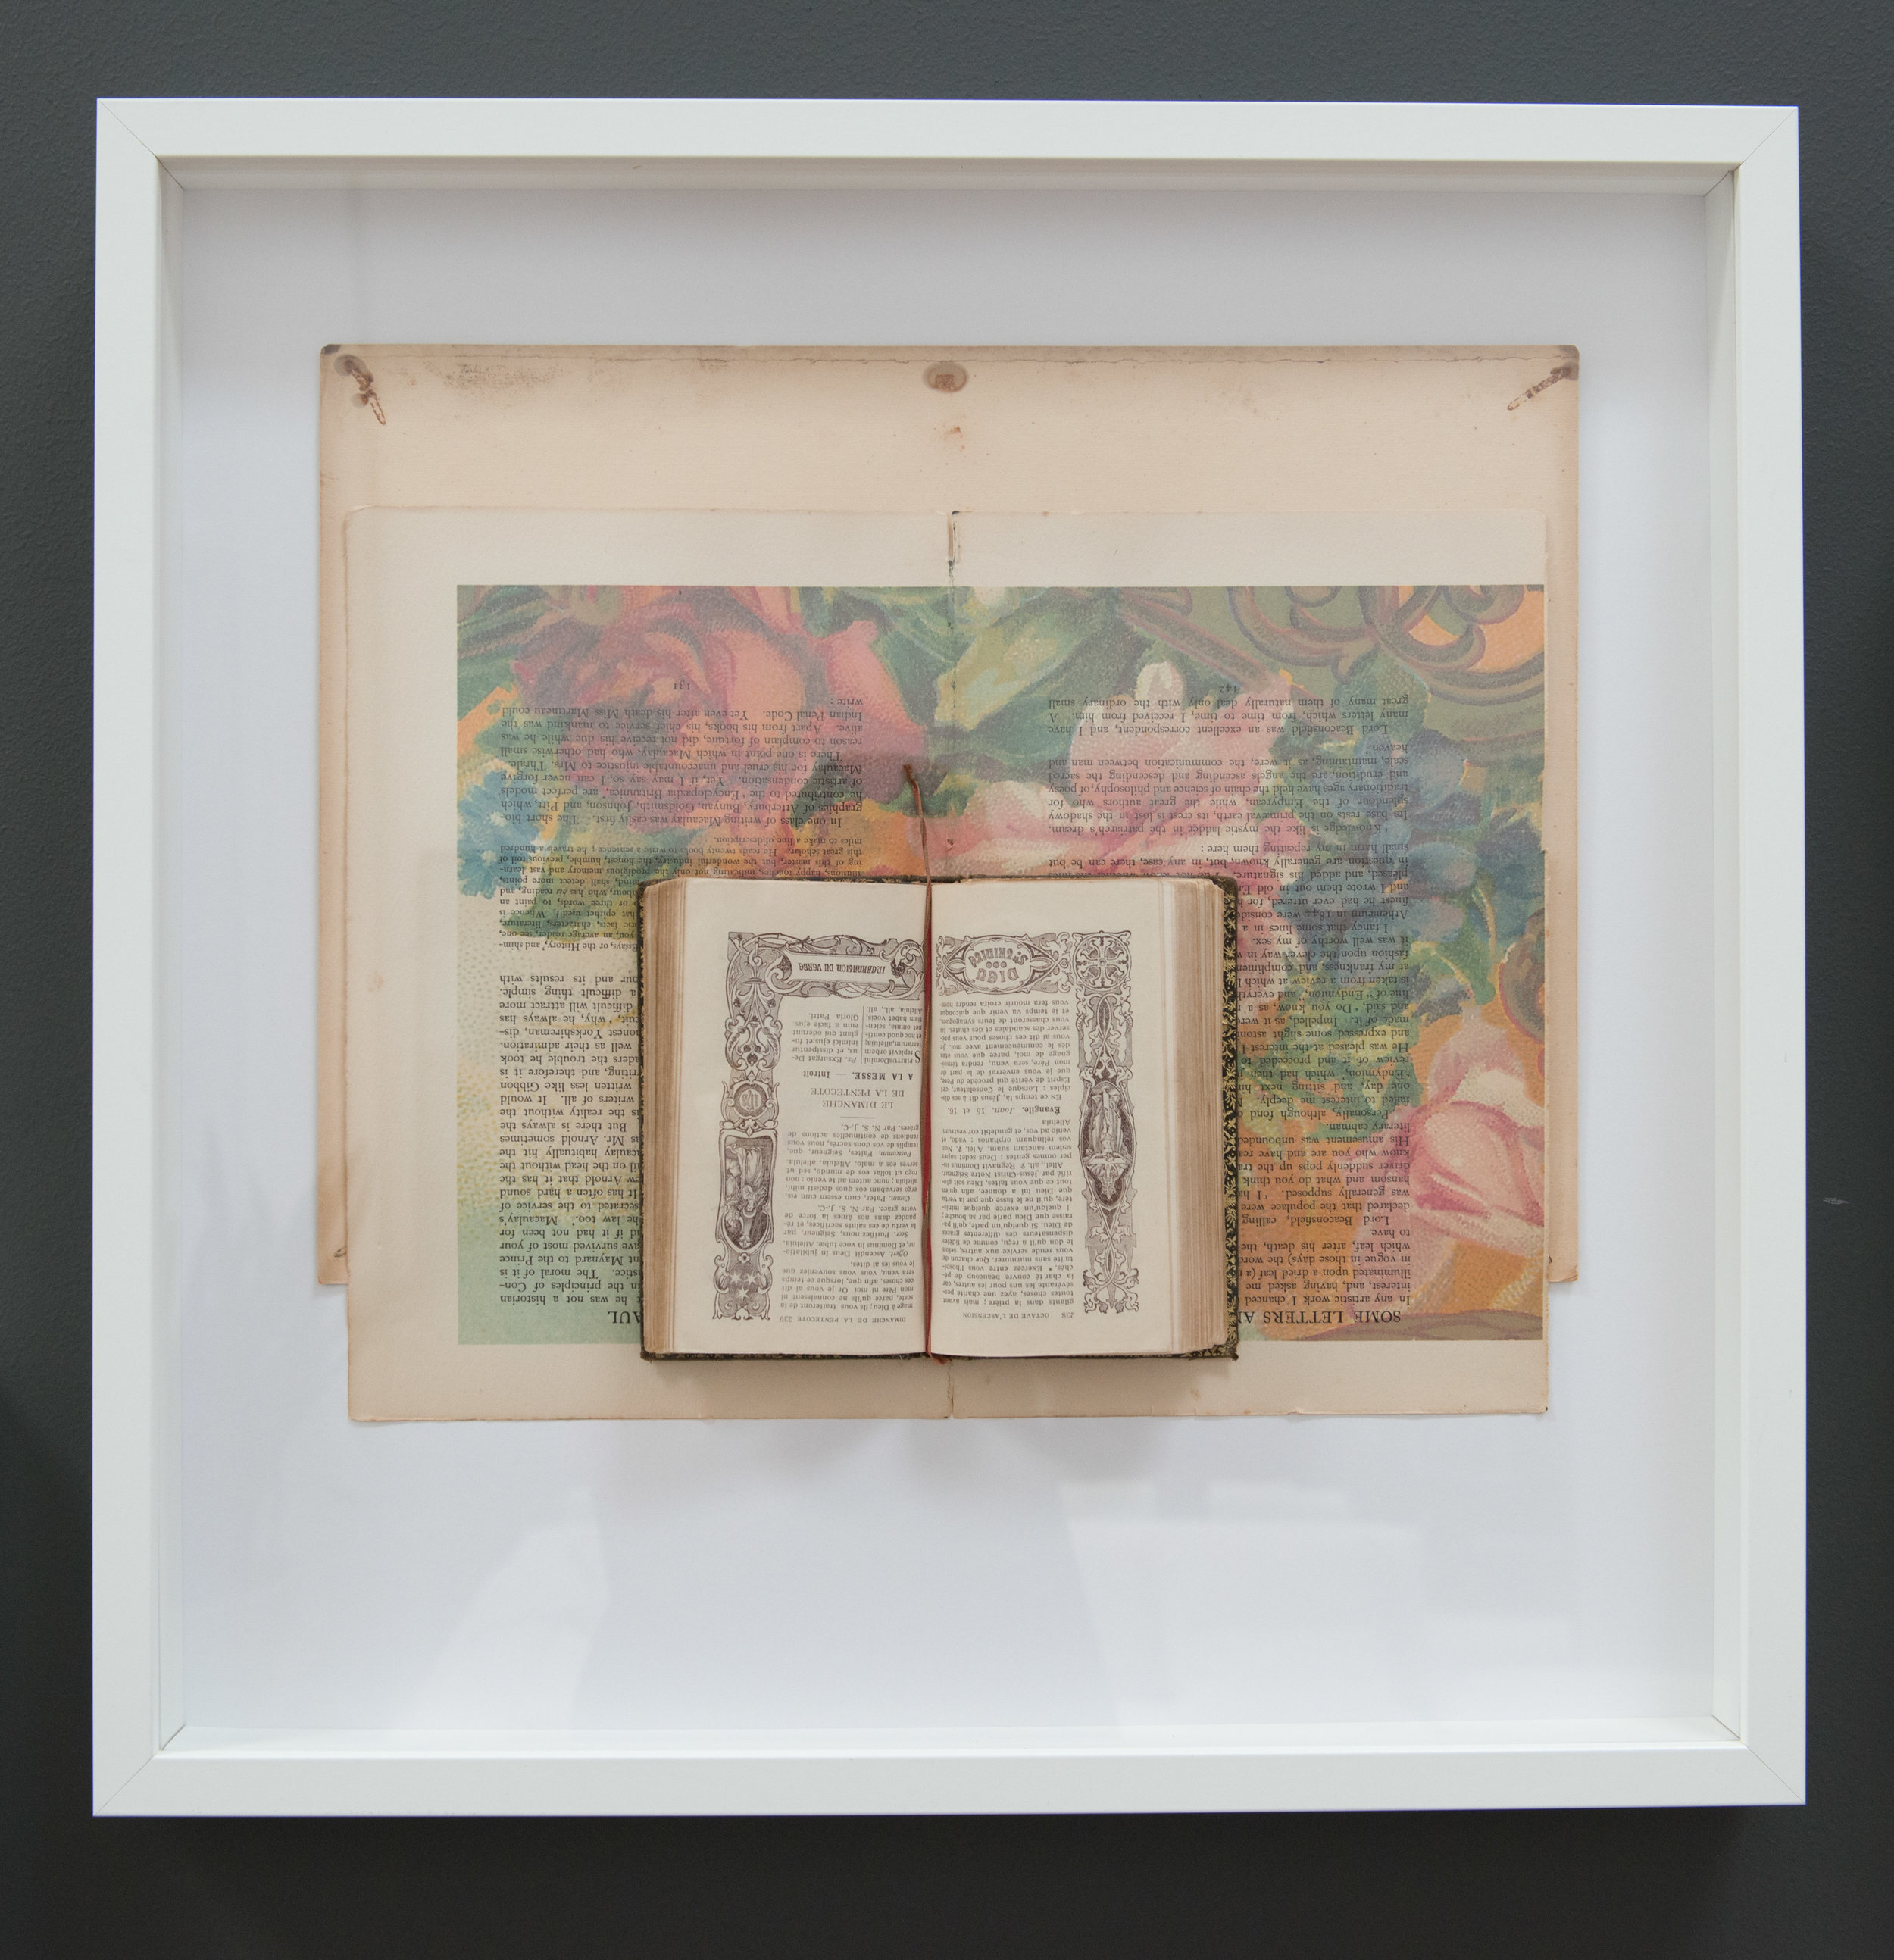 Untitled III: Musée Fragonard Series